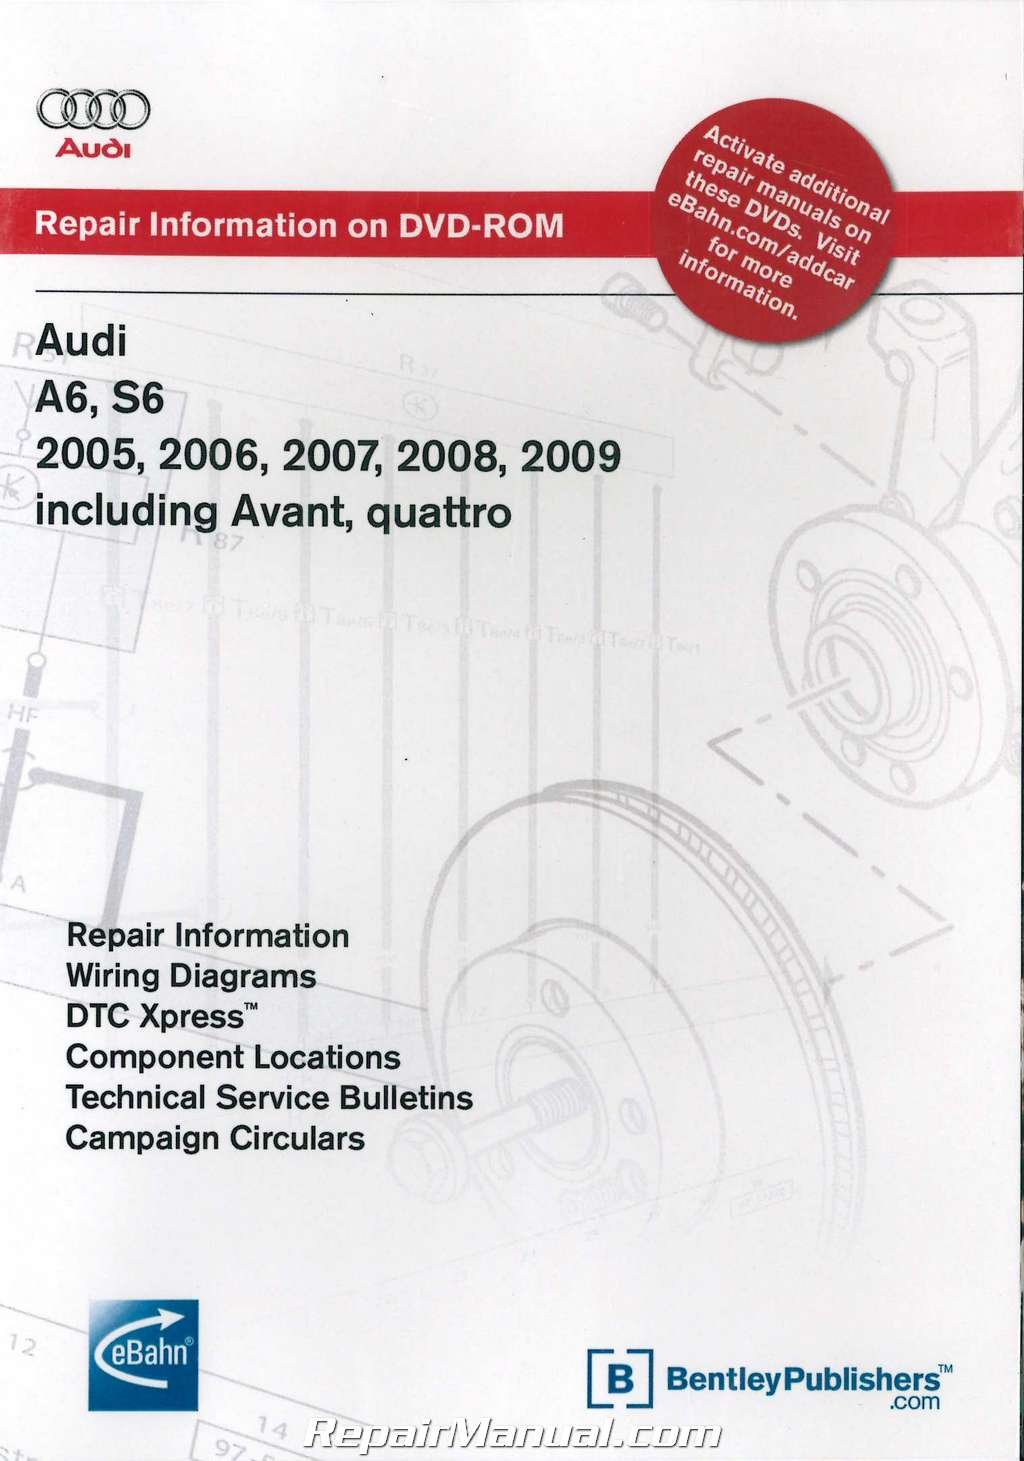 A86e 2008 Audi A4 Quattro Service Repair Manuals Software Wiring Library